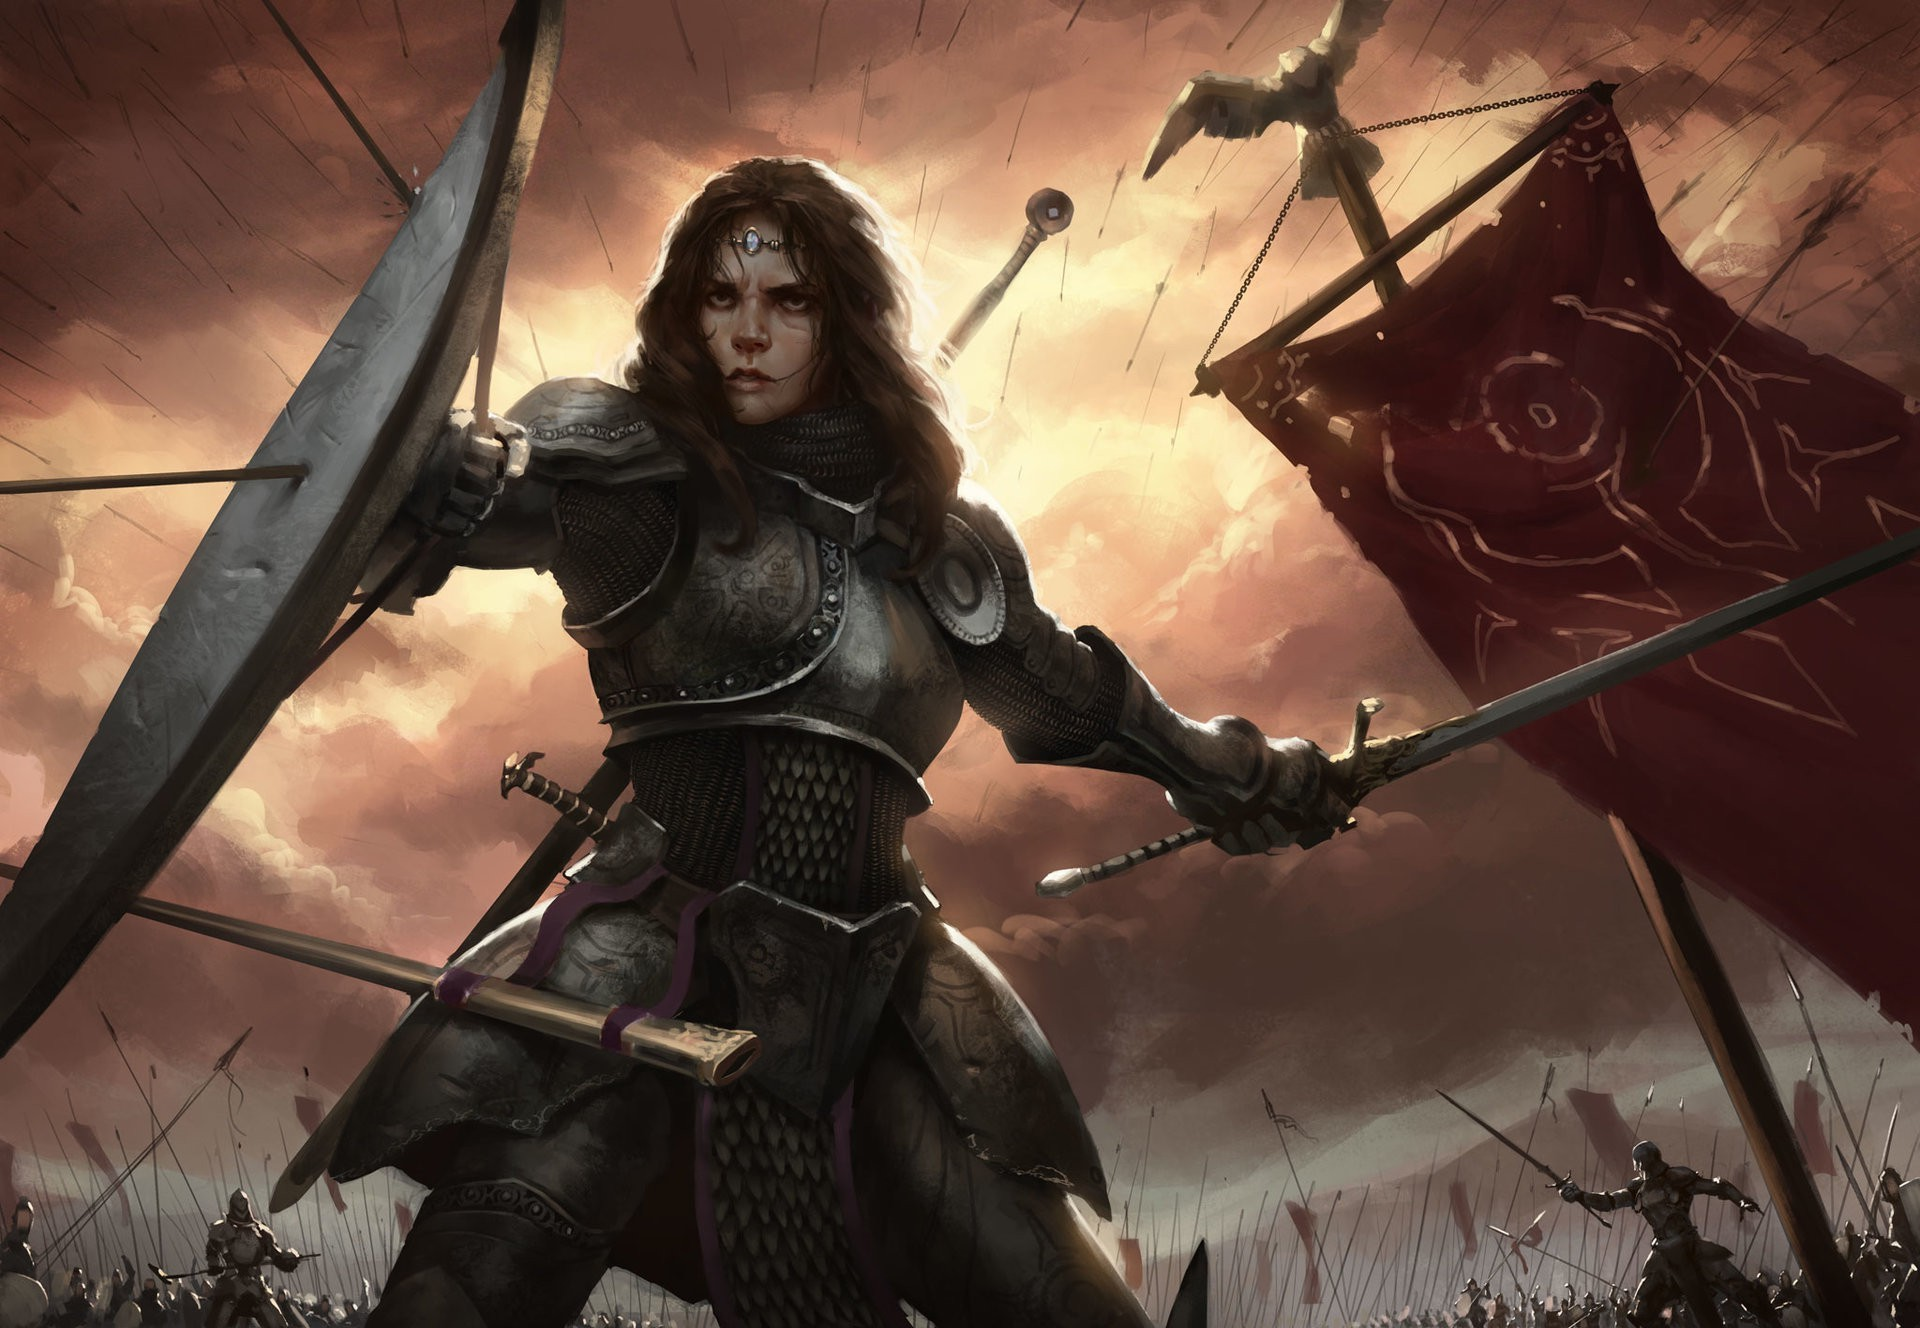 Warrior | Fantasy female warrior, Fantasy character design